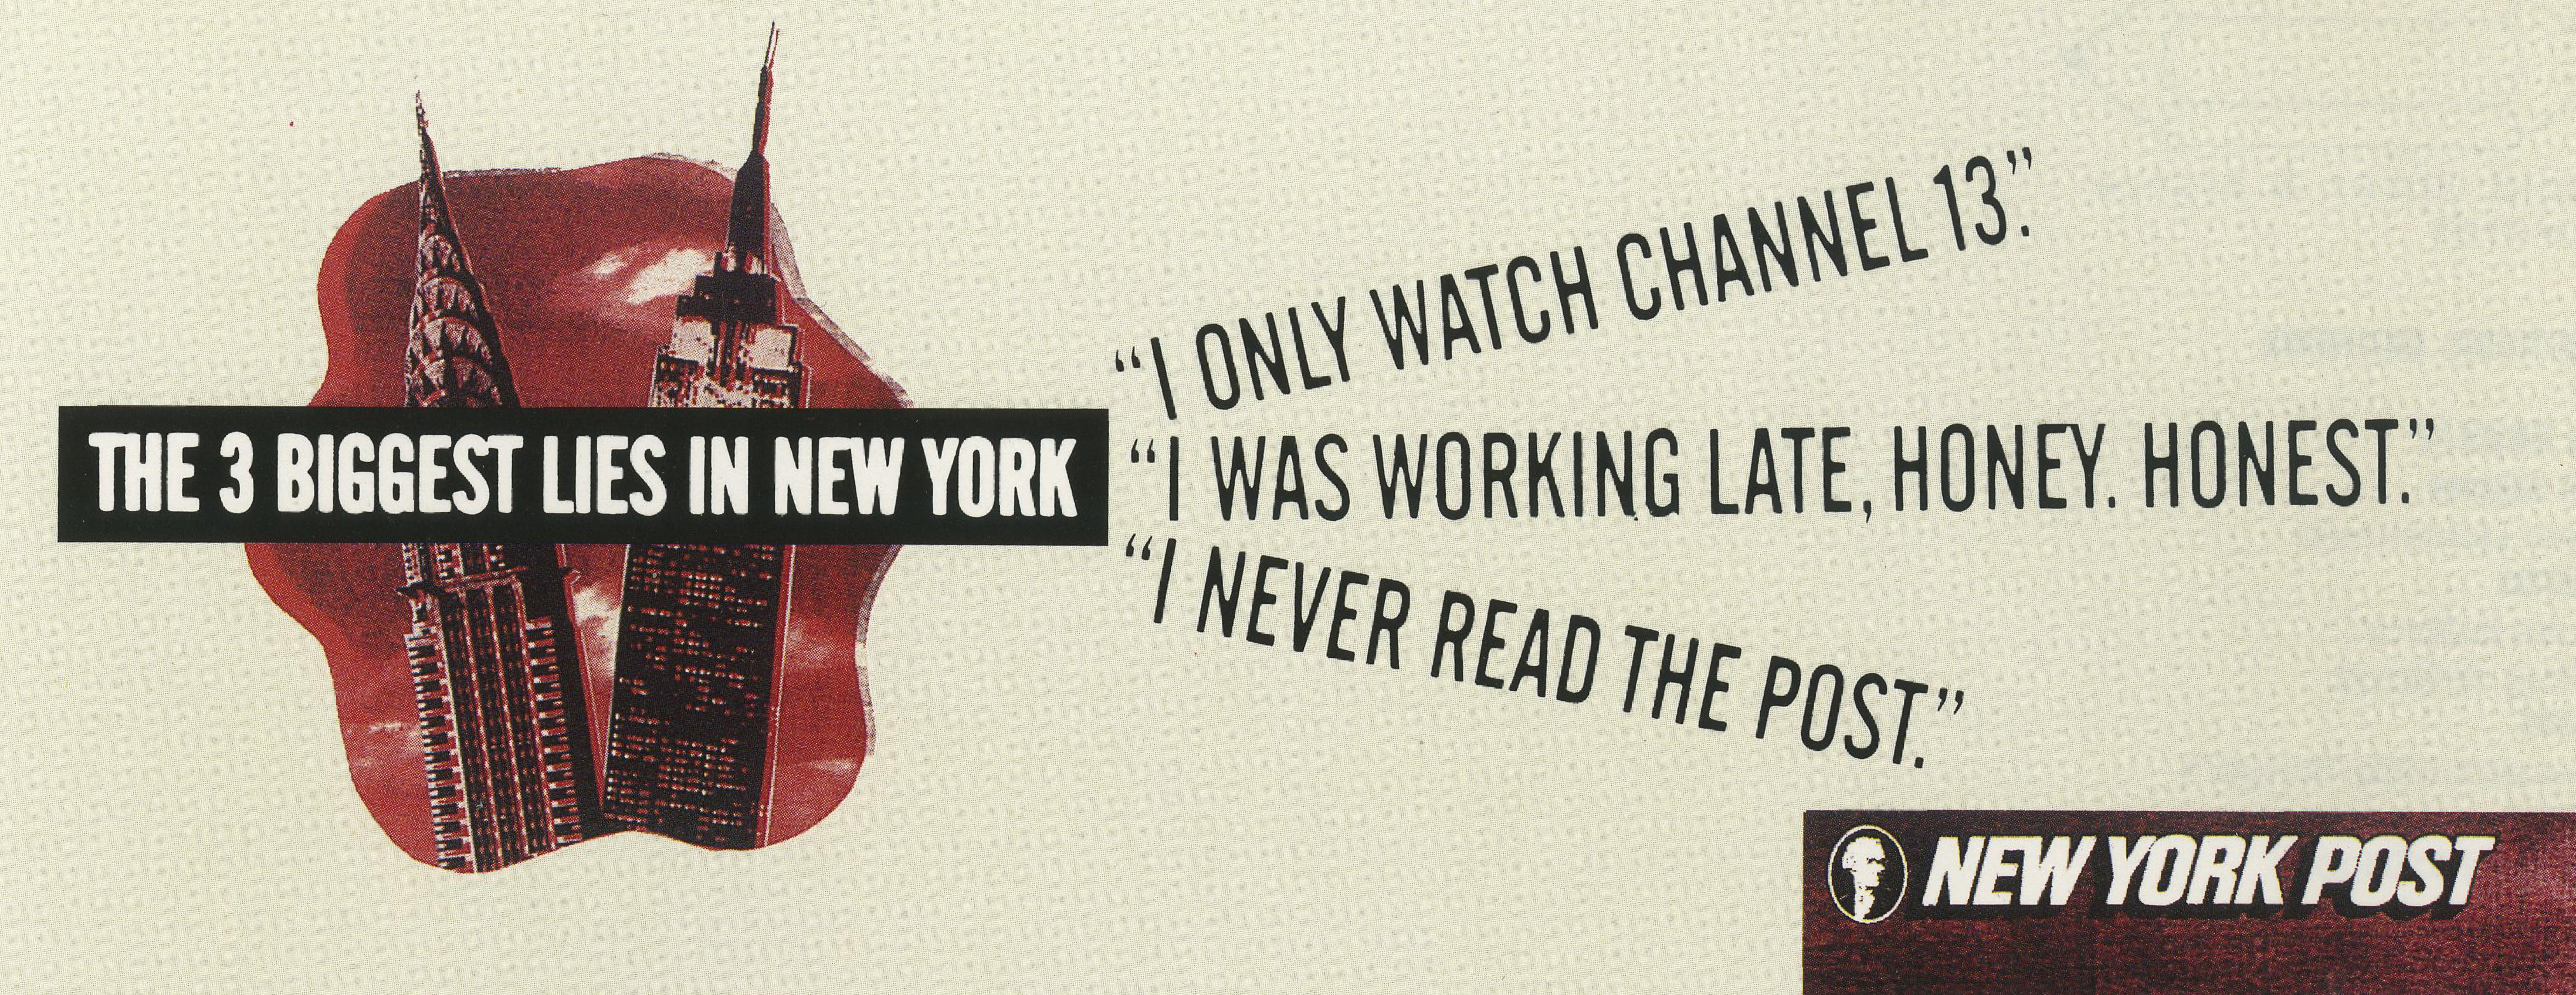 Kirsenbaum Bond - New York Post 'Channel 13'-01.jpg